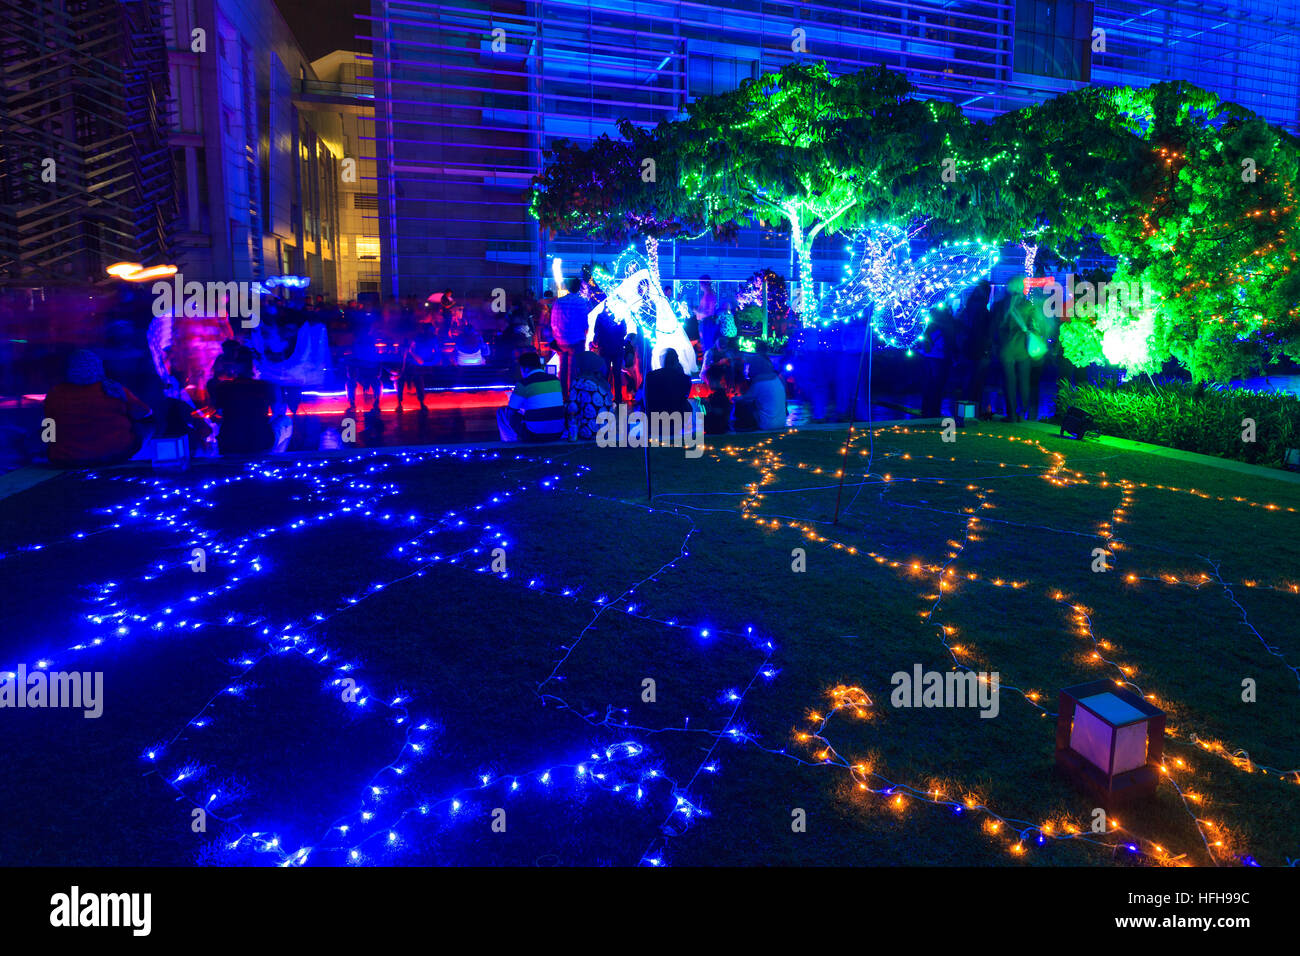 Festival Light And Motion Putrajaya 2016 (LAMPU). A Colourful Light  Projection At Putrajaya Malaysia. Credit: Sharkawi Che Din/Alamy Live News